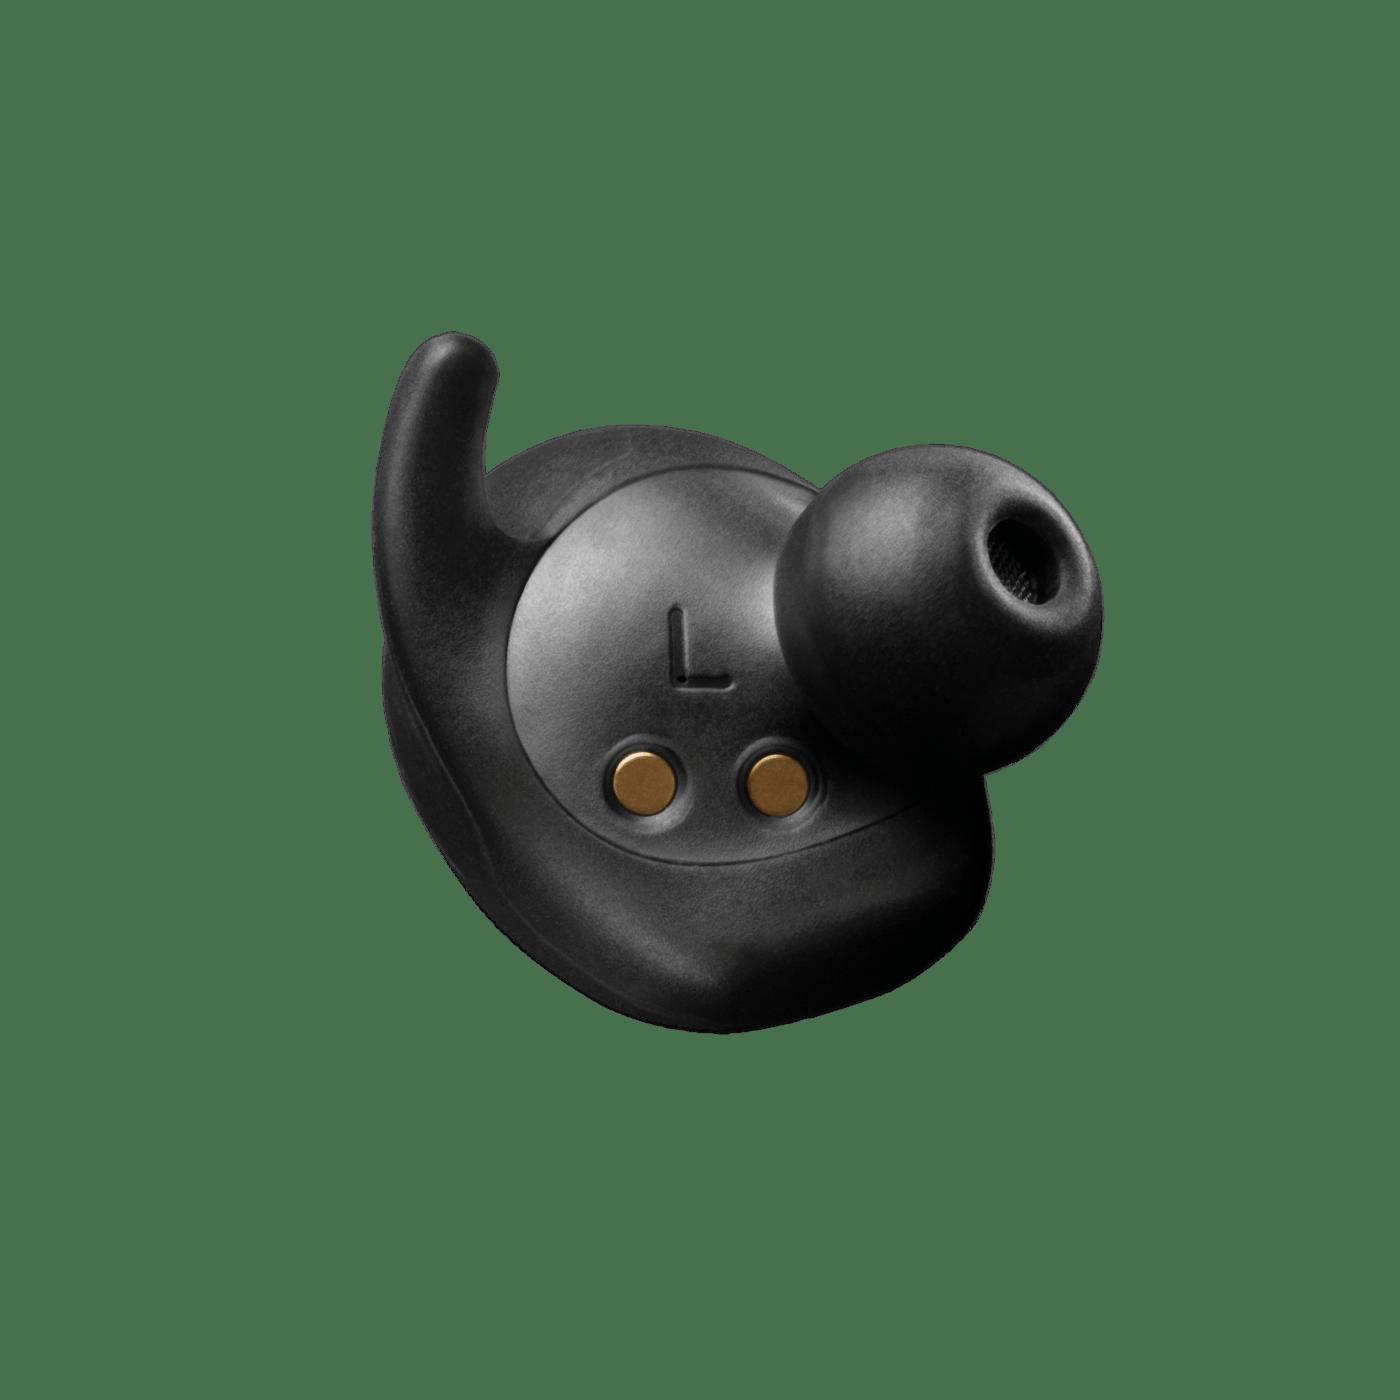 Jabra Elite Sport Earbud Left (Original)